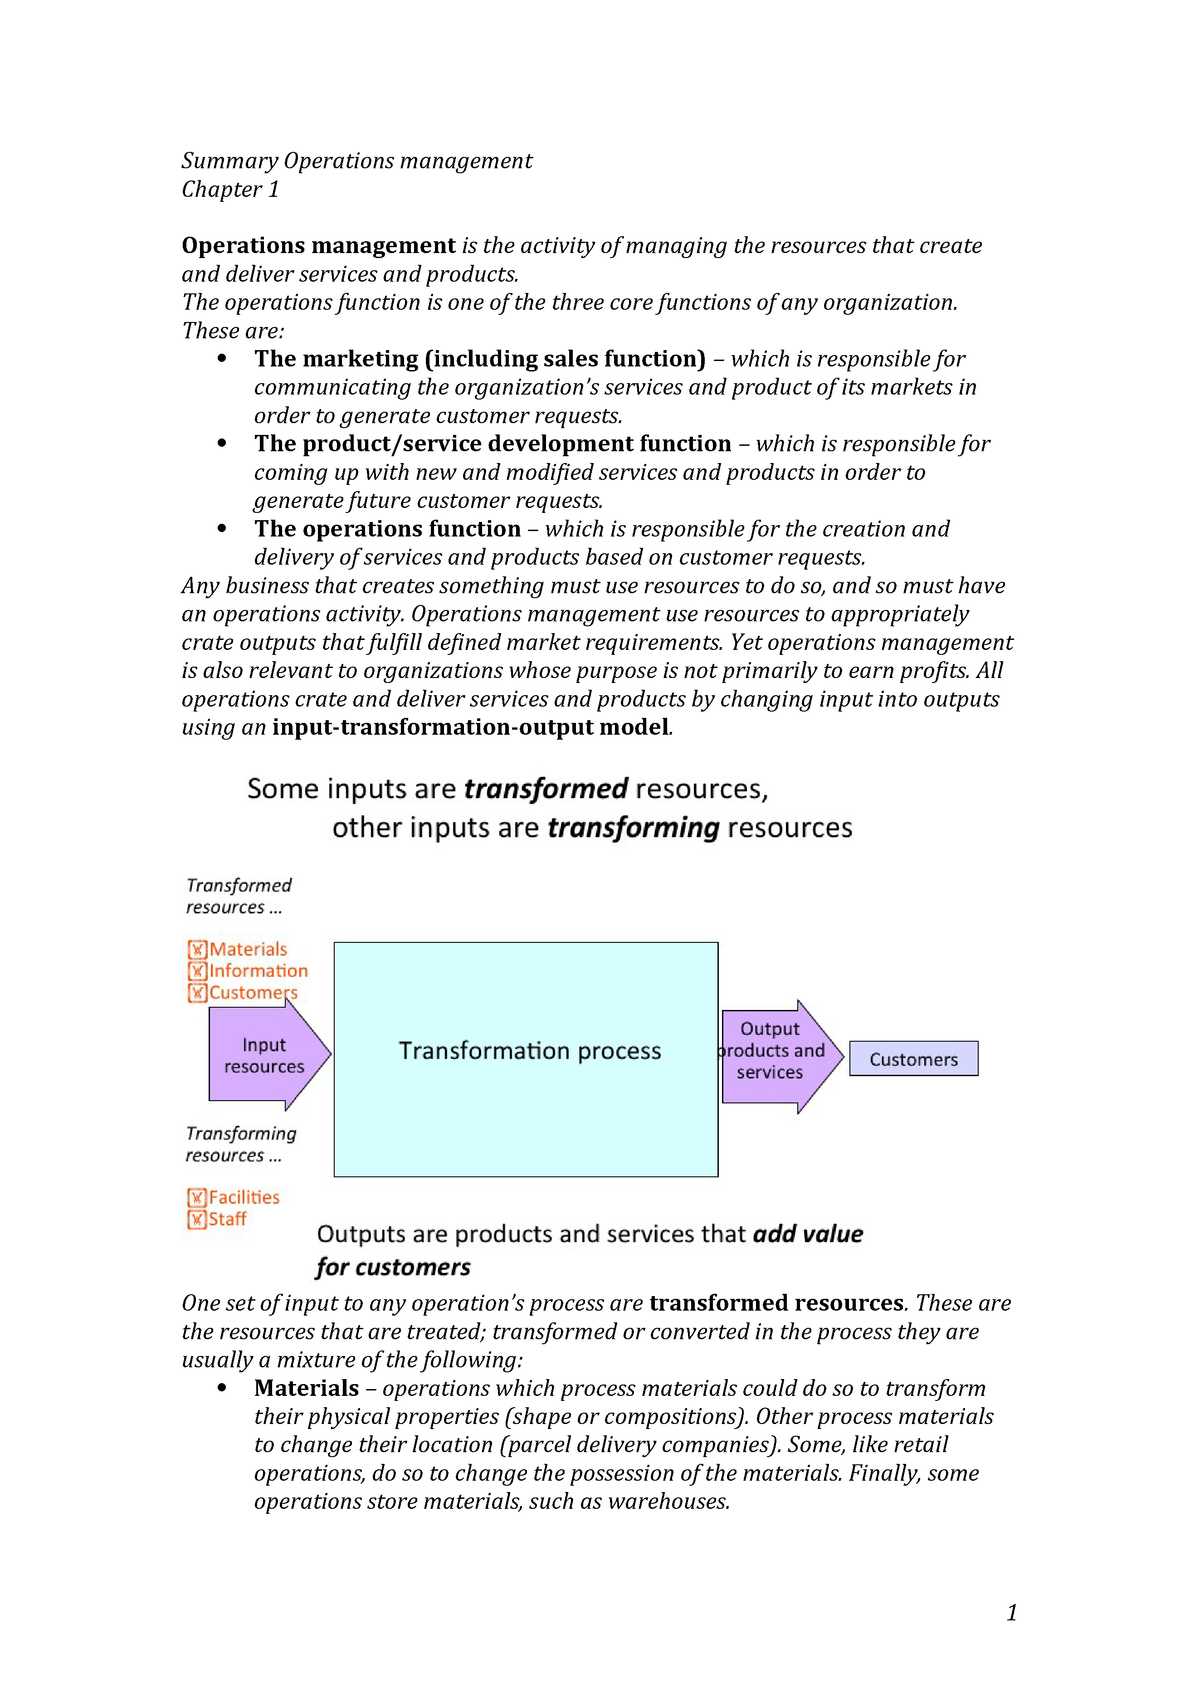 Summary Operations Management - Summary Chapter 1-19   - StuDocu